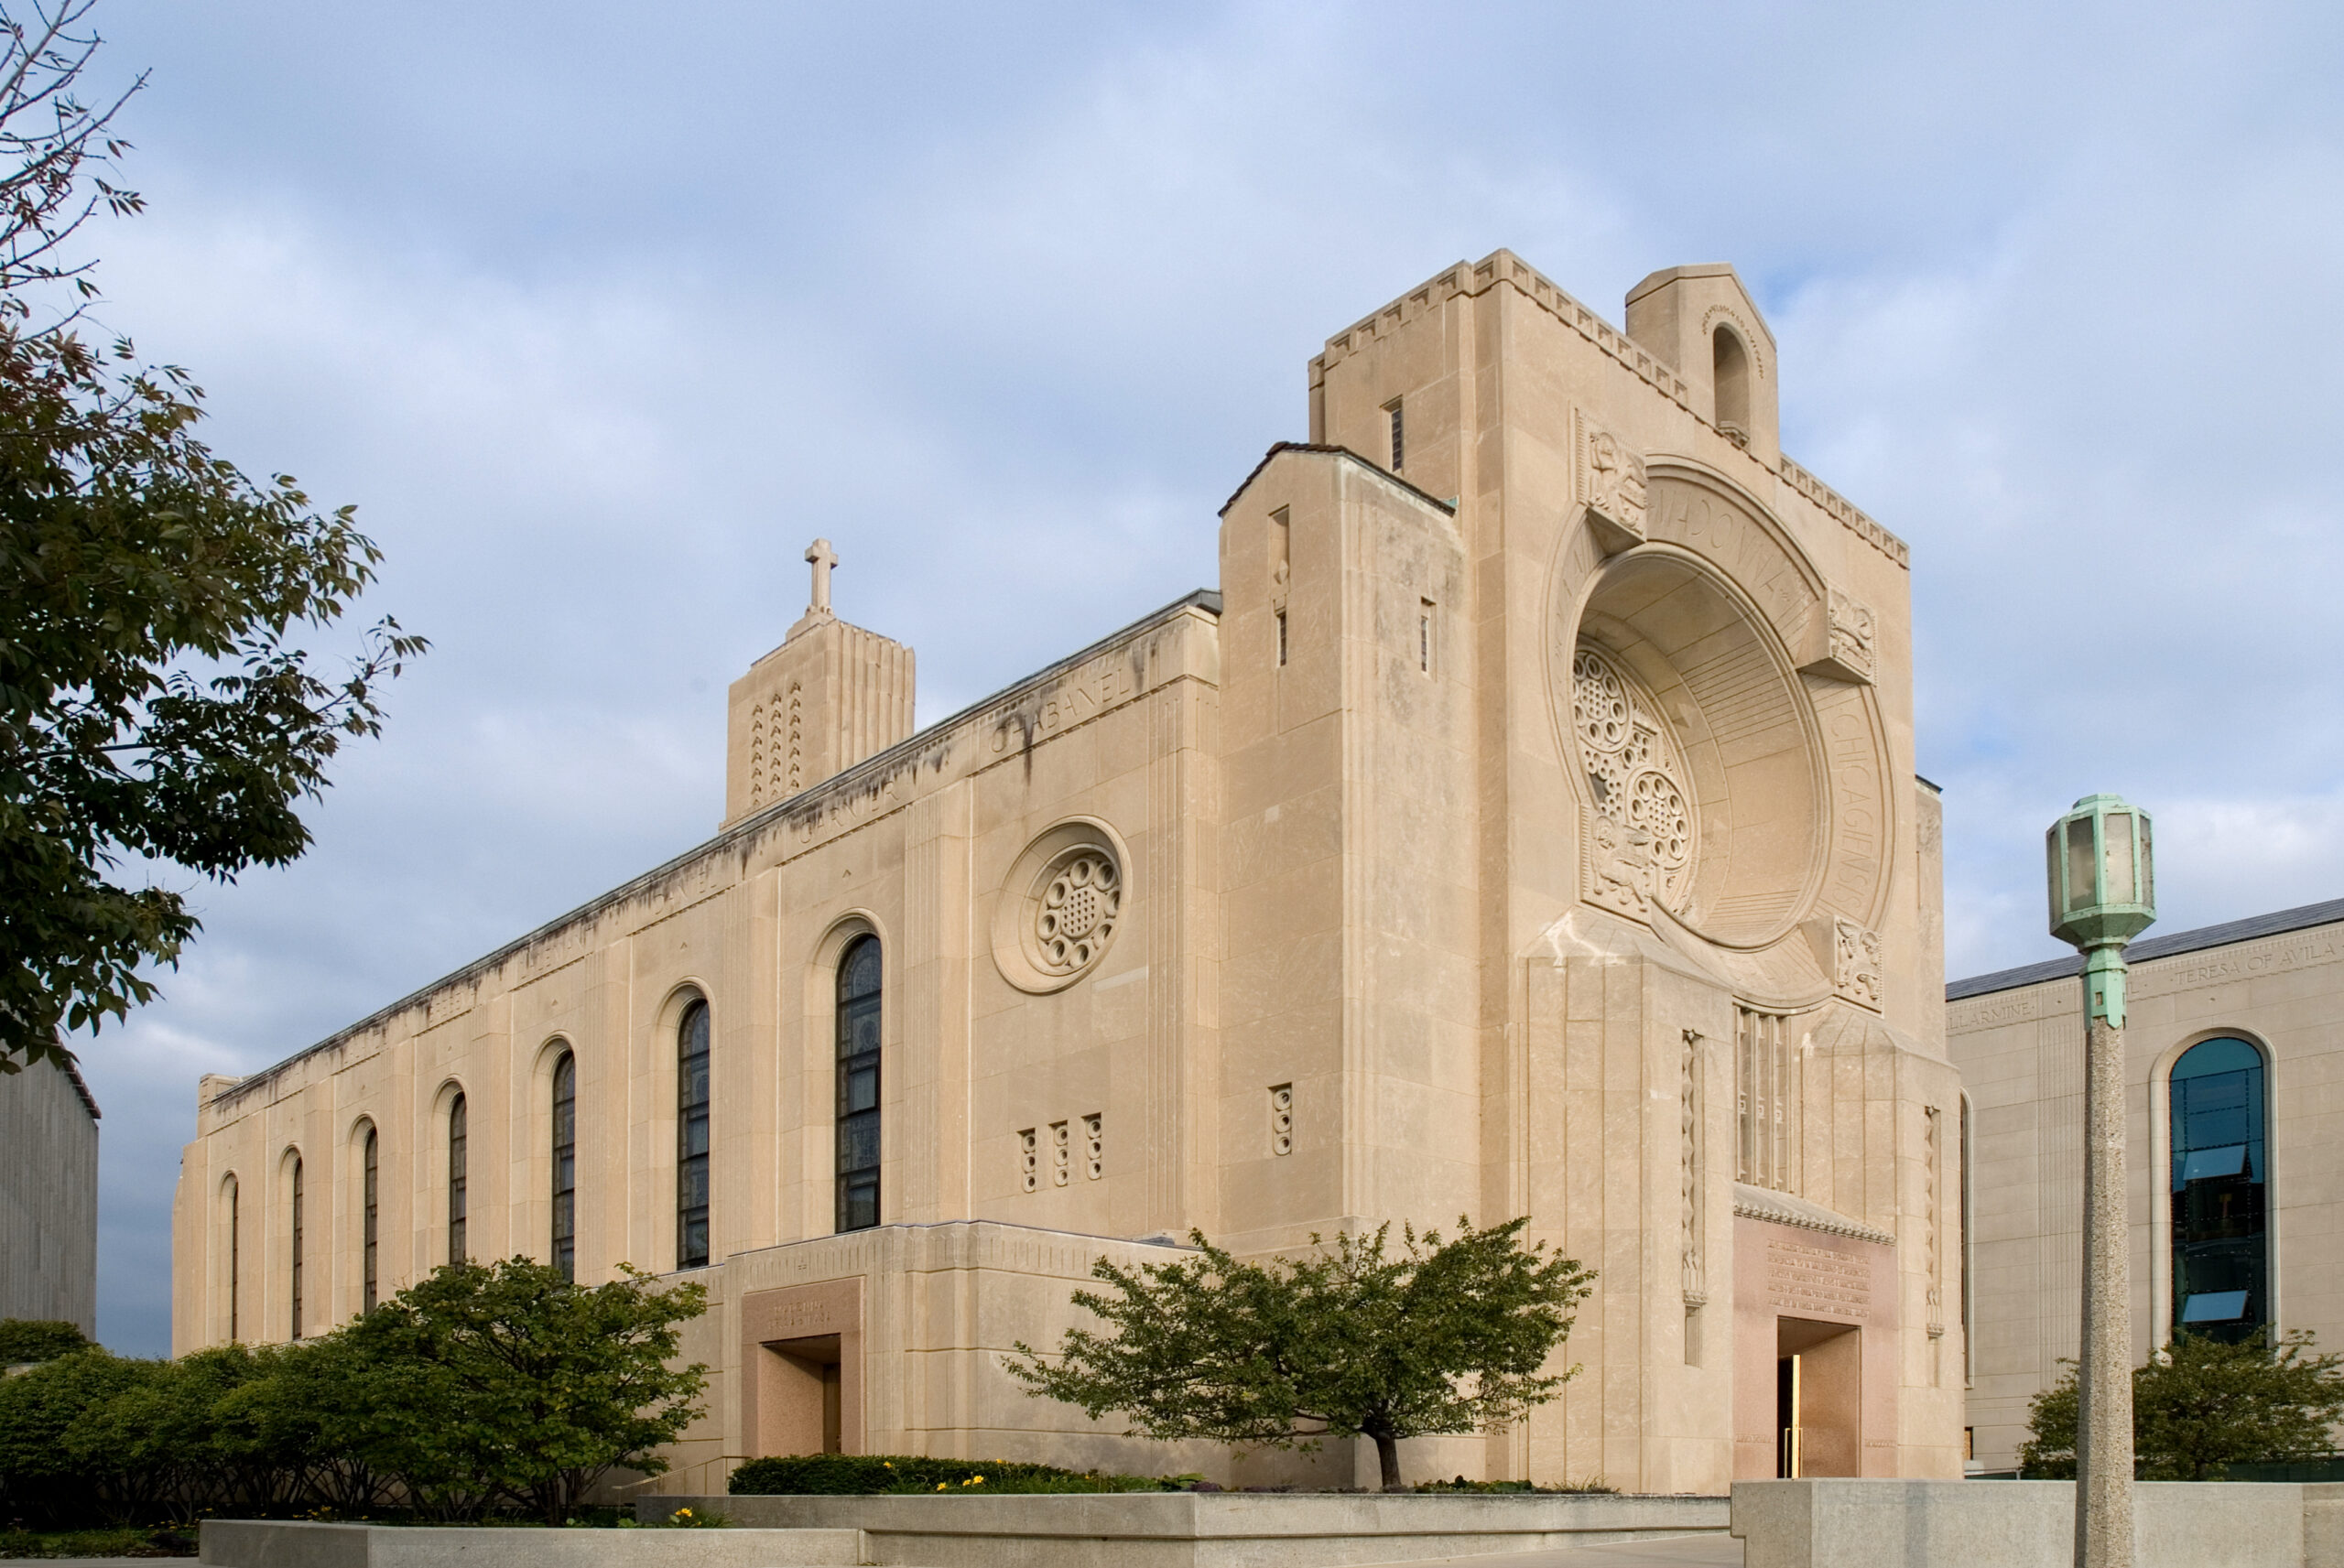 Madonna Della Strada Chapel at Loyola University